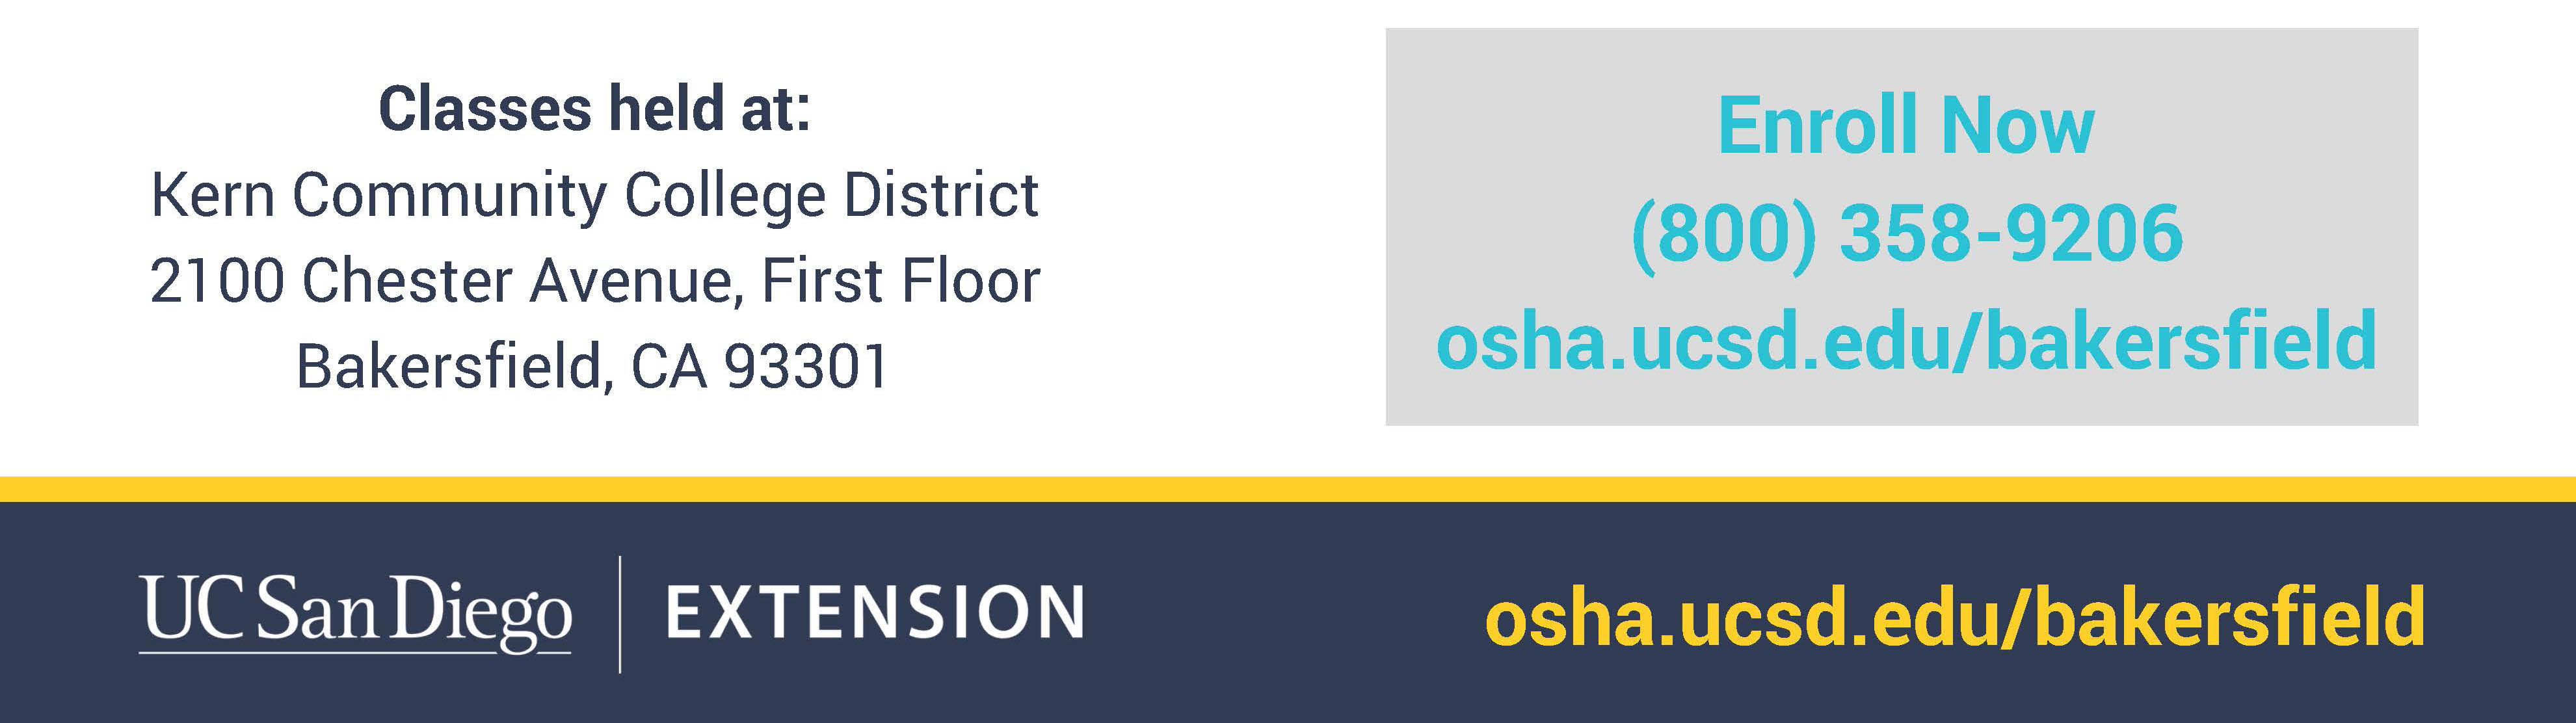 UCSD / Bakersfield OSHA training